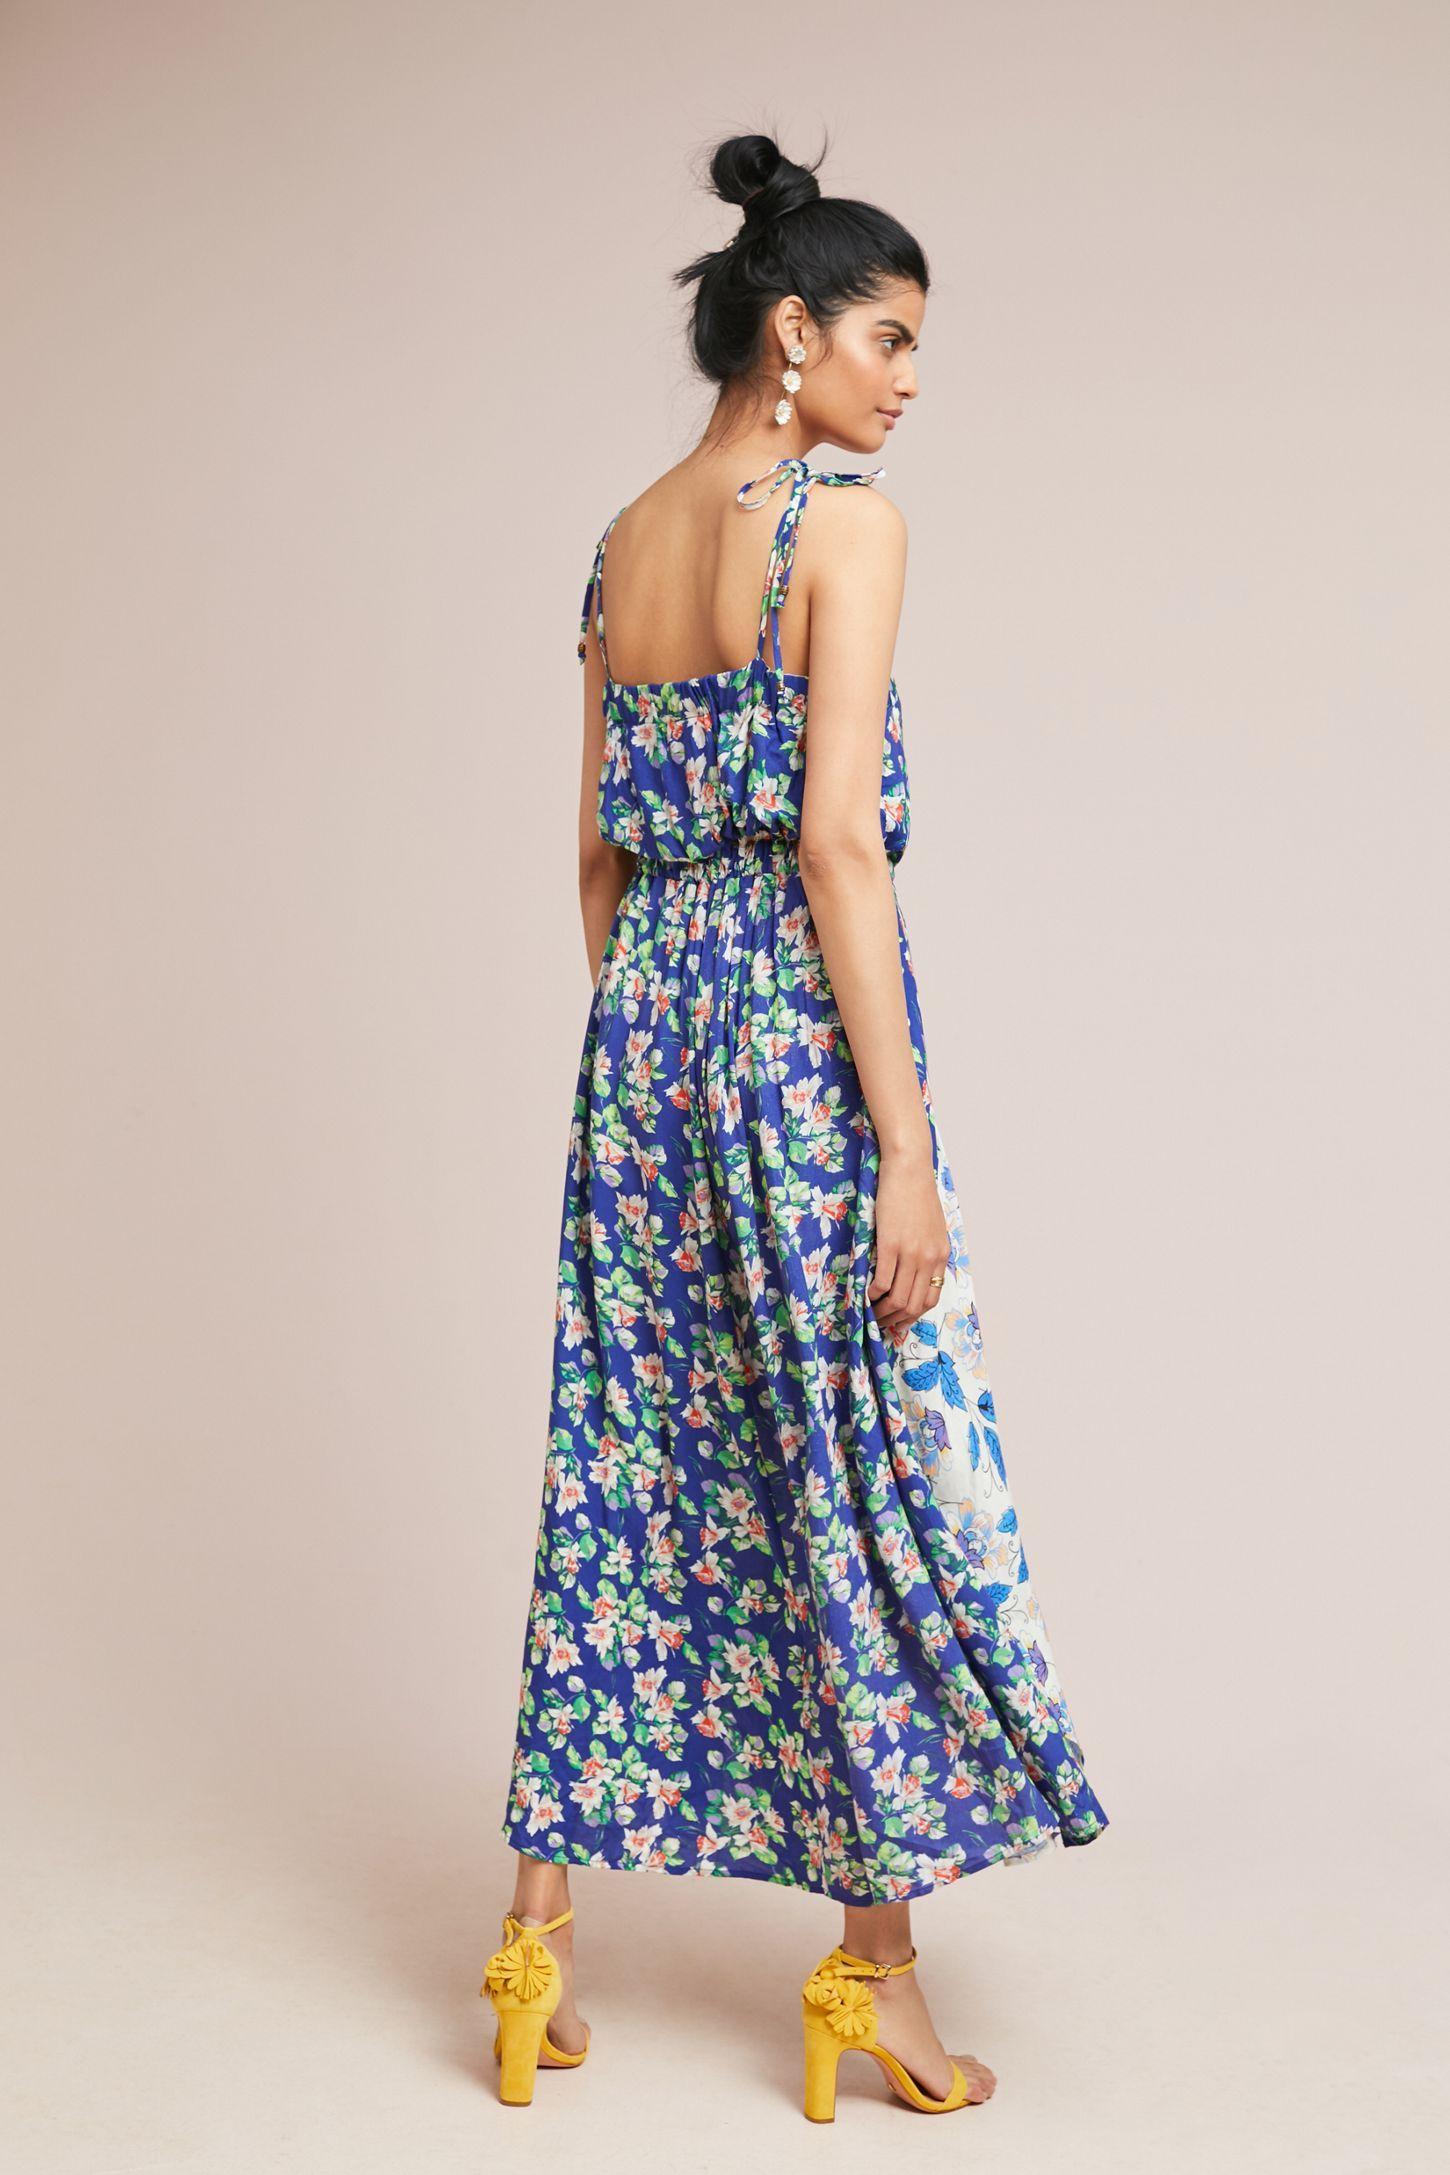 c14c65f684e86 Passaro Printed Dress | Clothes inspiration | Dresses, Summer ...